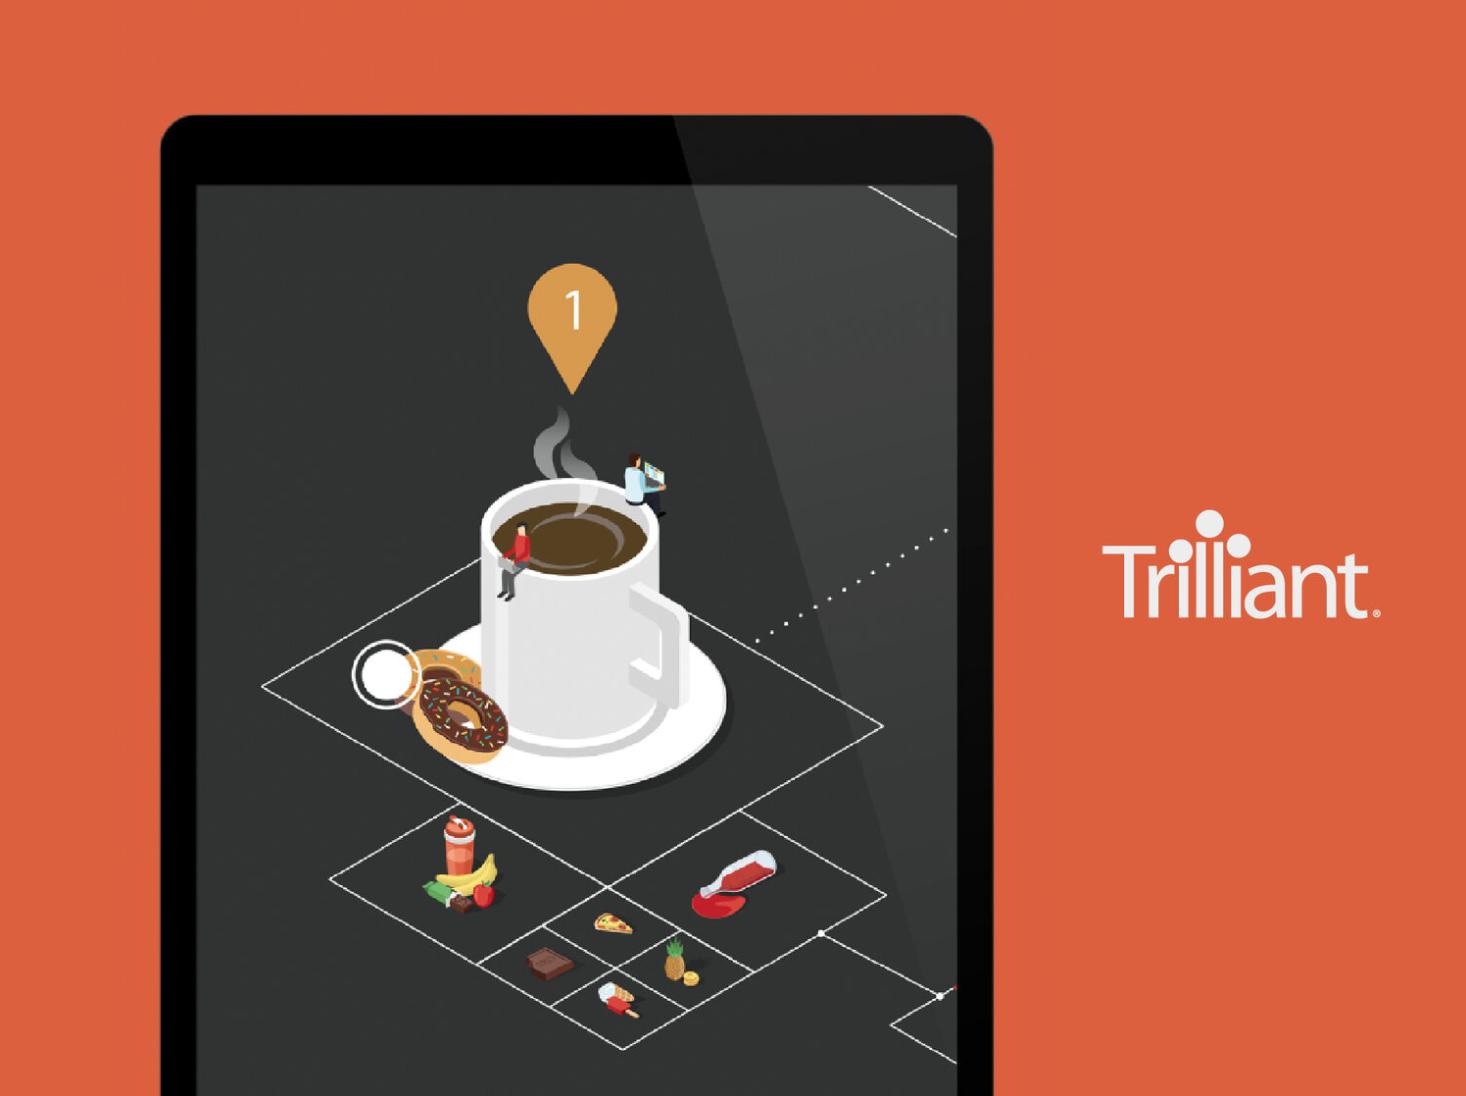 Trilliant Experiential Marketing Case Study